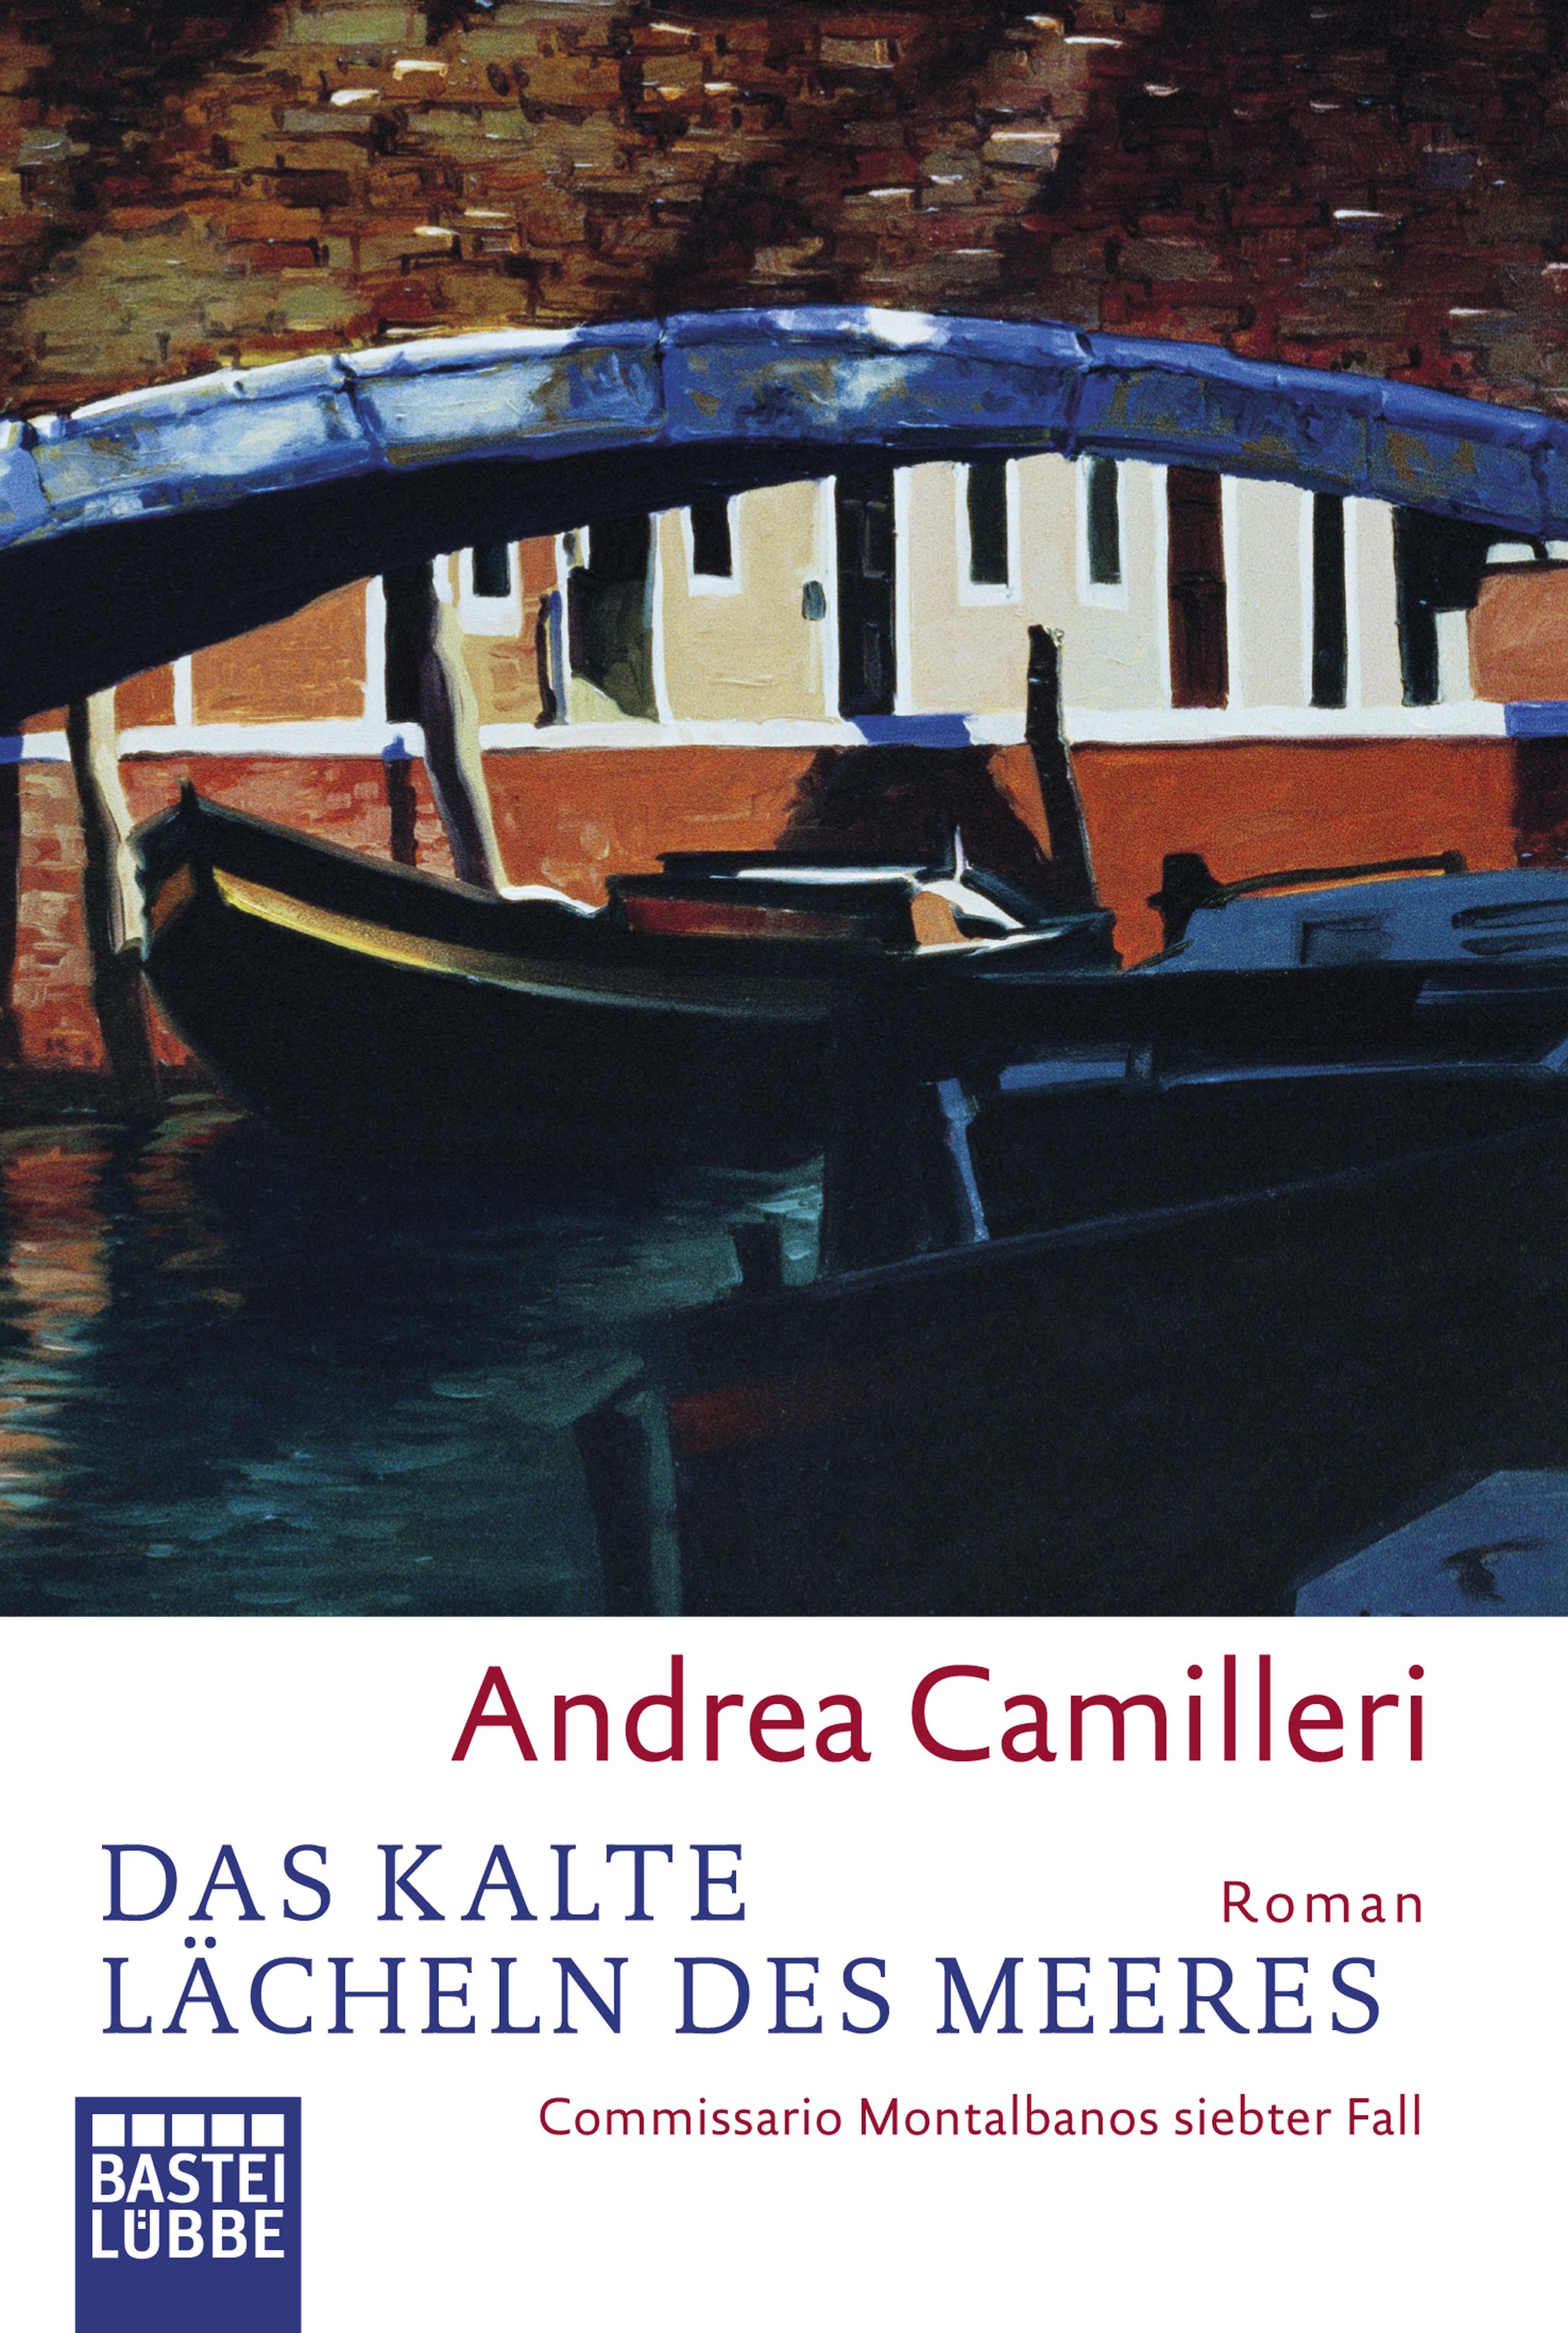 Das kalte Lächeln des Meeres: Commissario Montalbanos siebter Fall - Andrea Camilleri